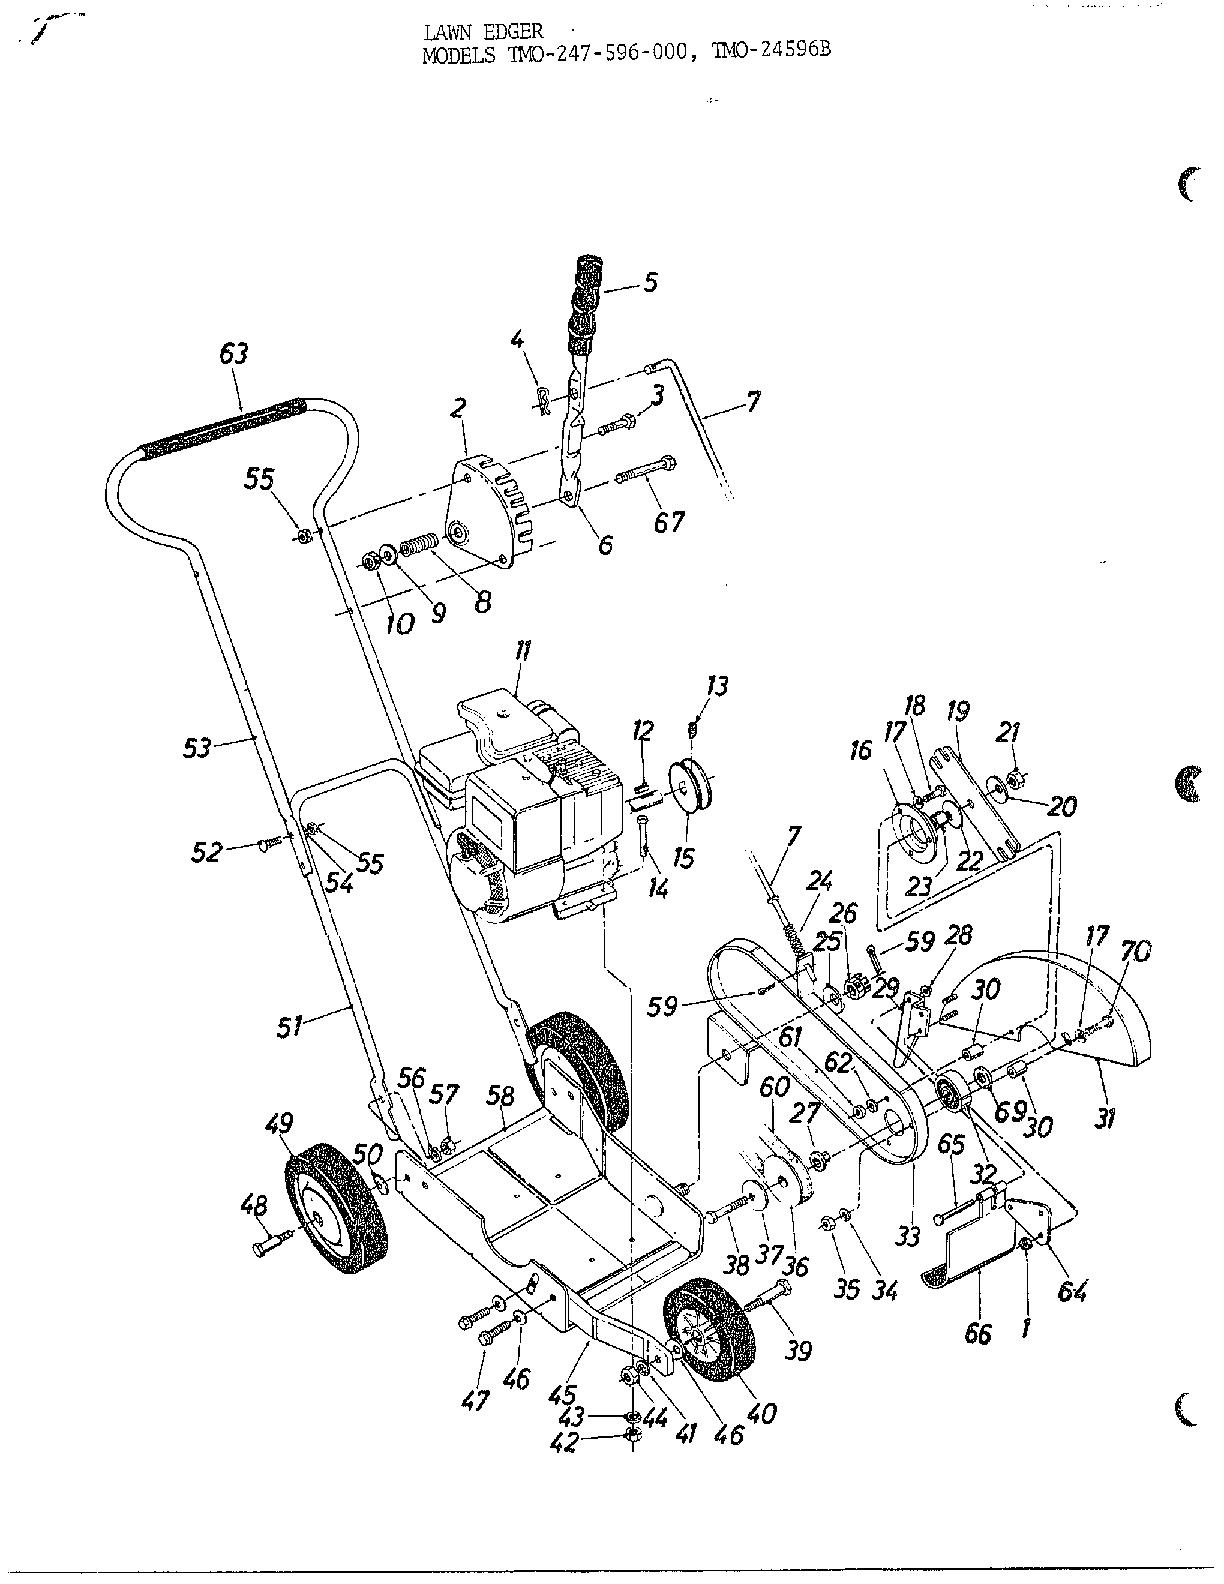 Mtd model 247-604-000 edger genuine parts